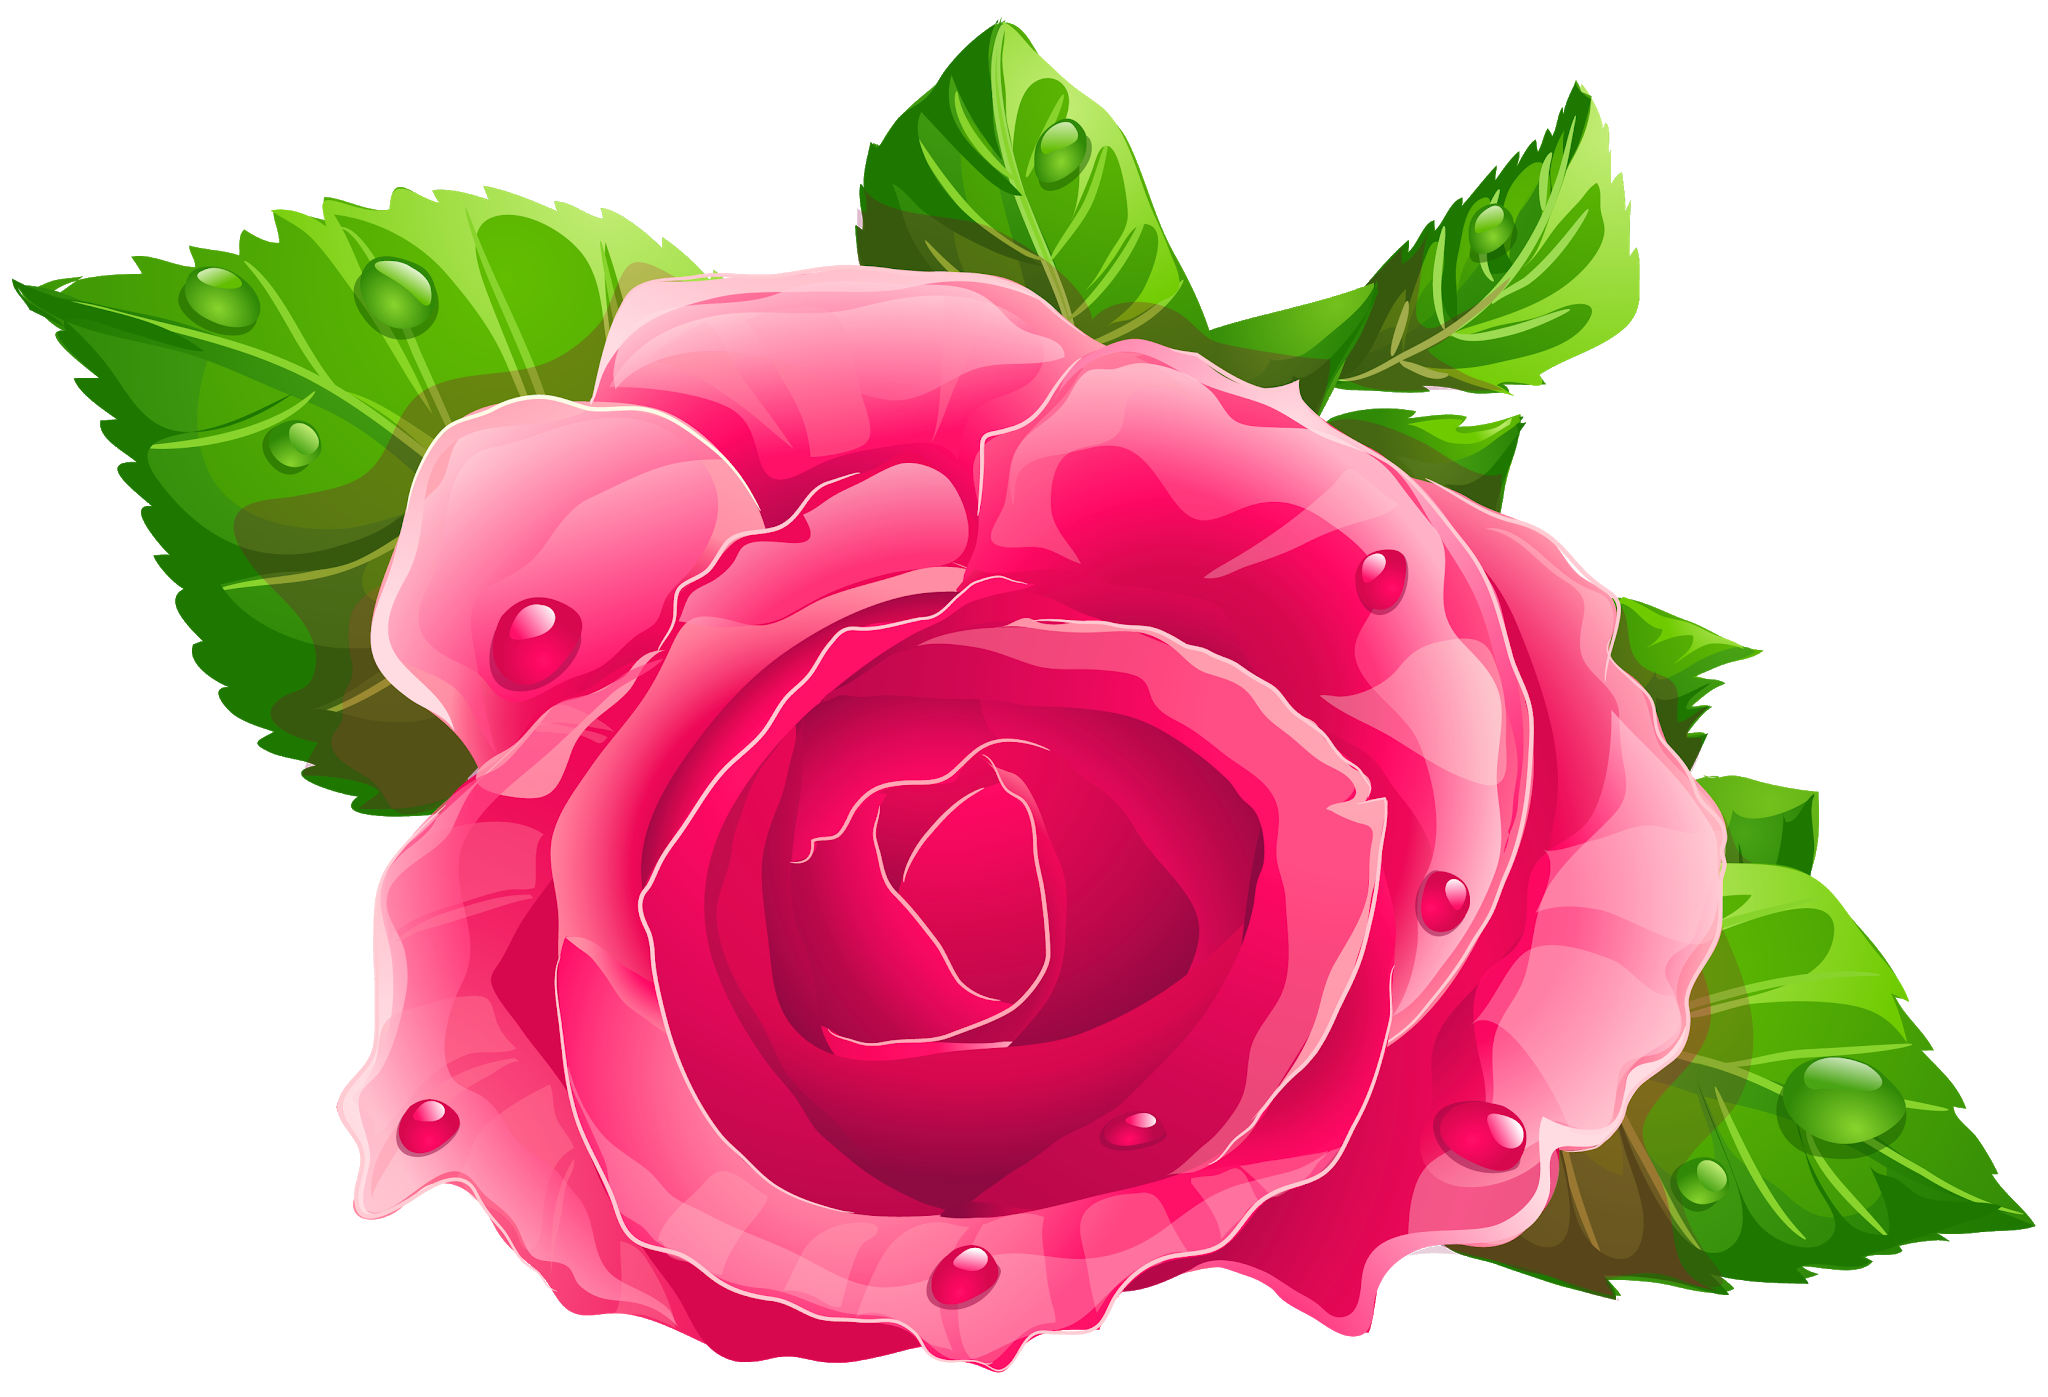 Pink Flowers Rose Beautiful Transparent Pink Rose Png Clipart Picture Pink Rose Png Rose Clipart Flowers